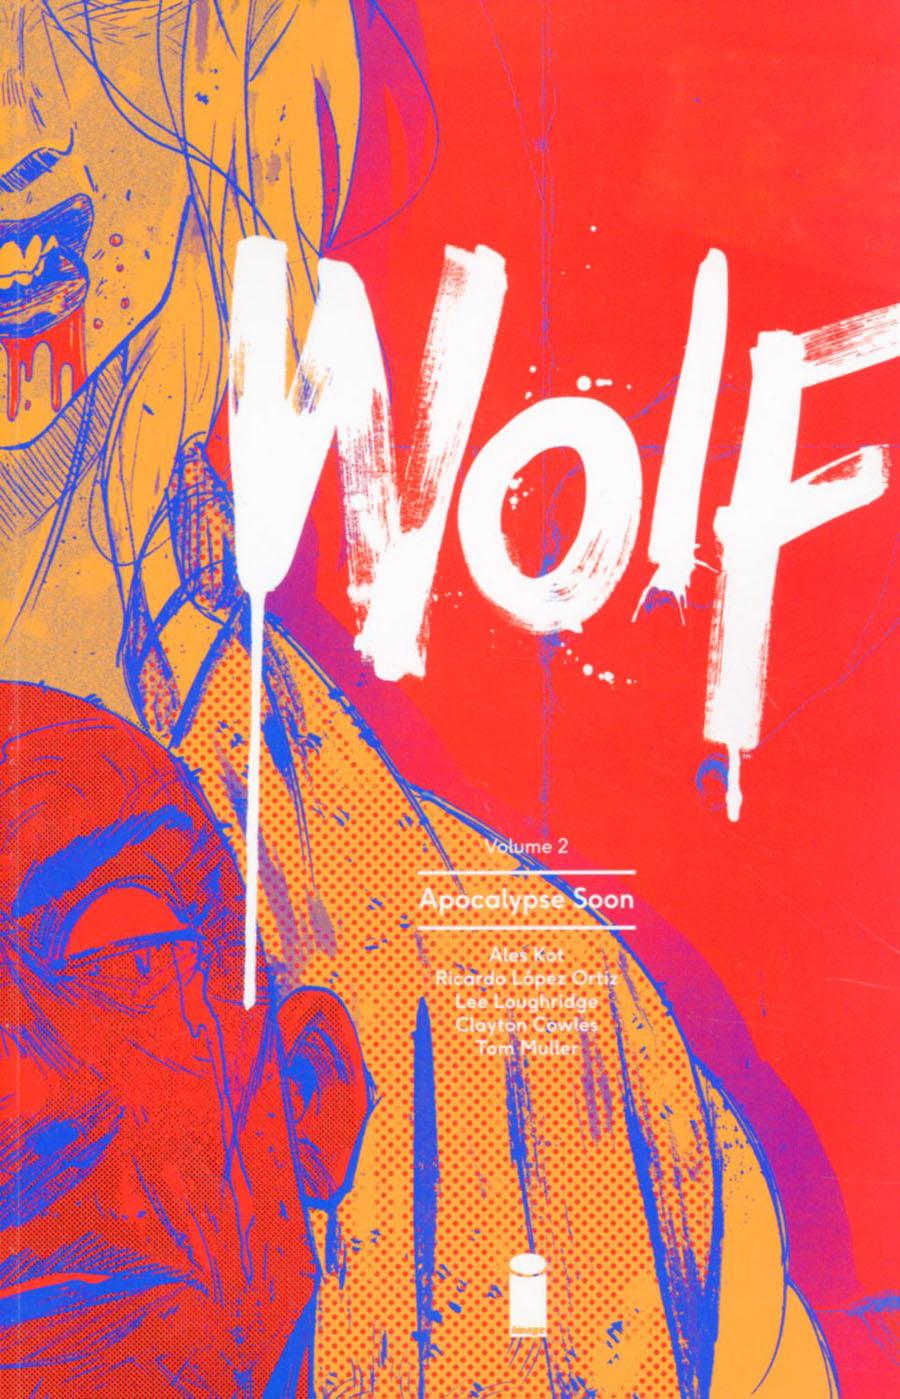 Wolf Vol 2 Apocalypse Soon TP